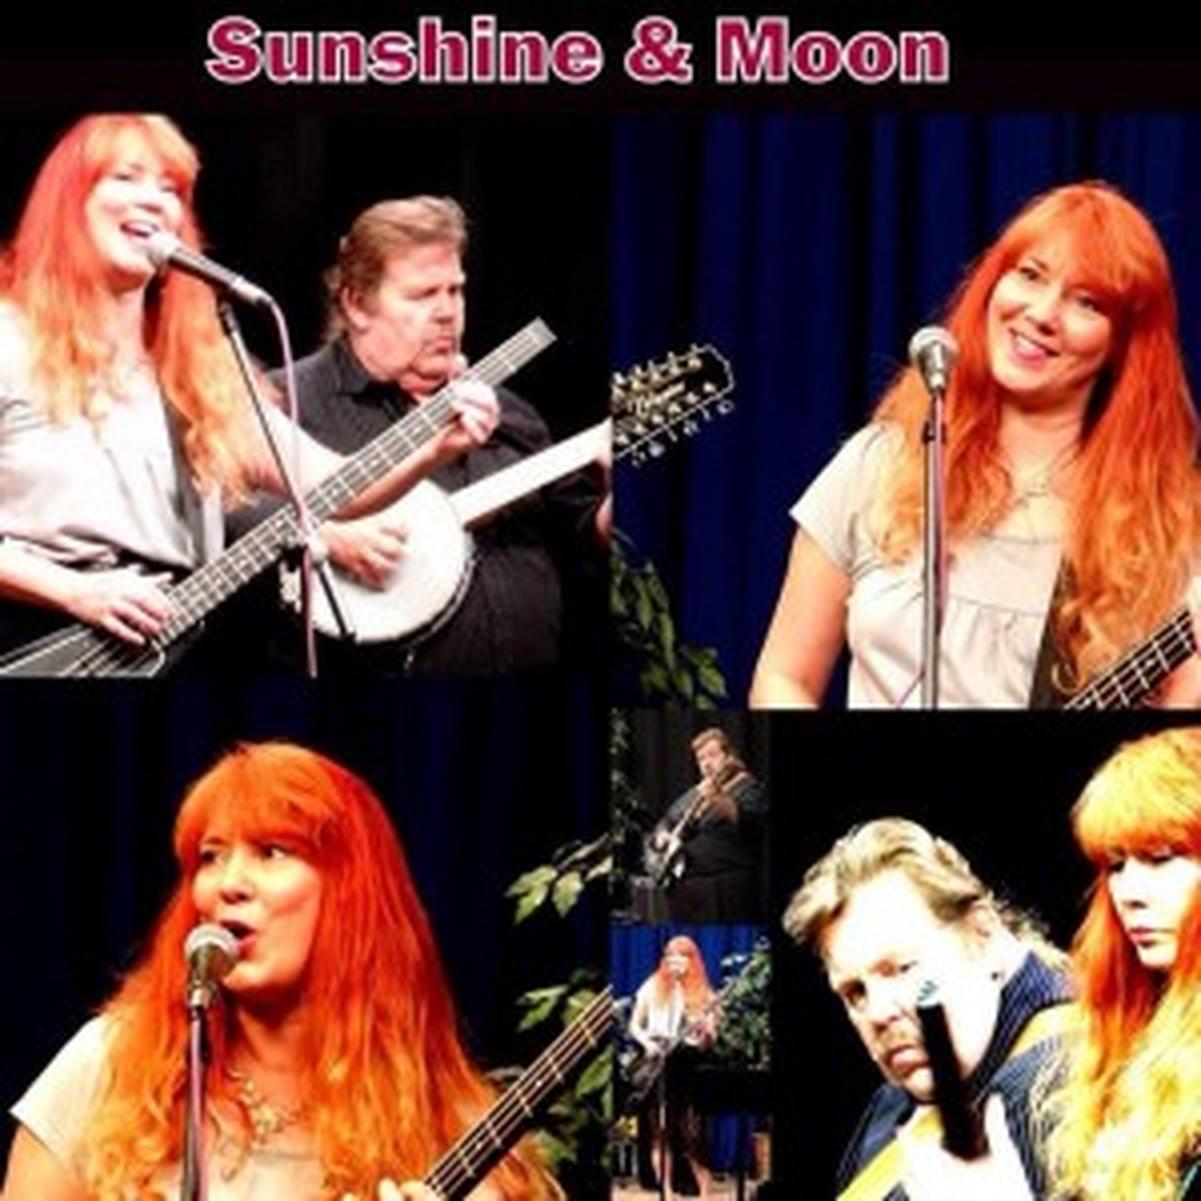 Sunshine & Moon